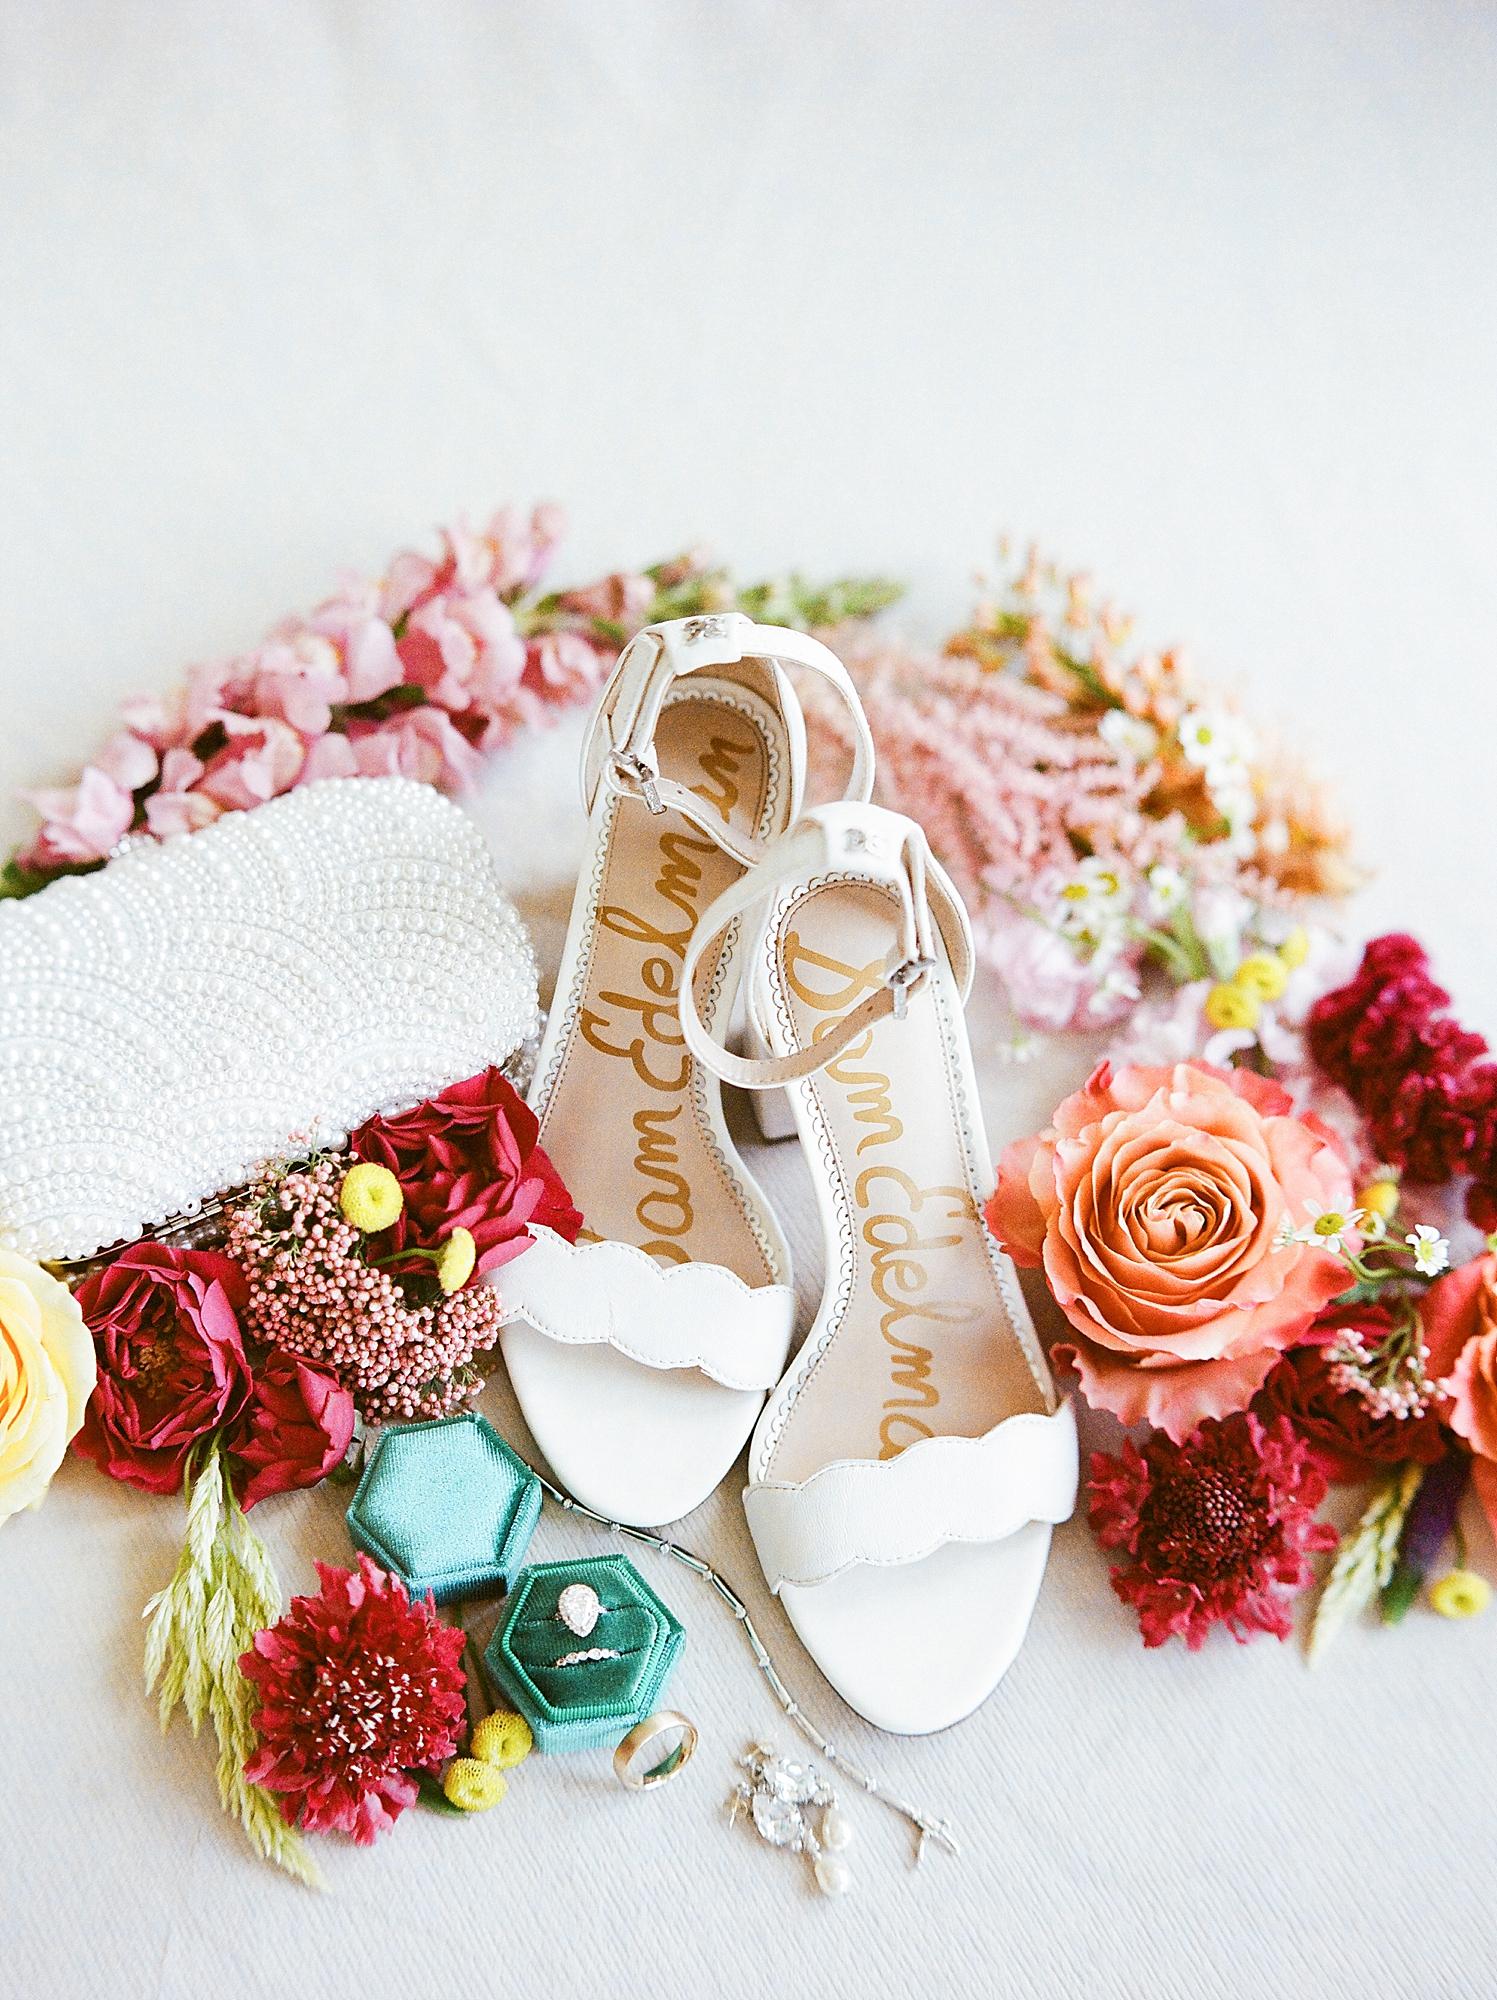 Colorful wedding day details at Bonnet island estate